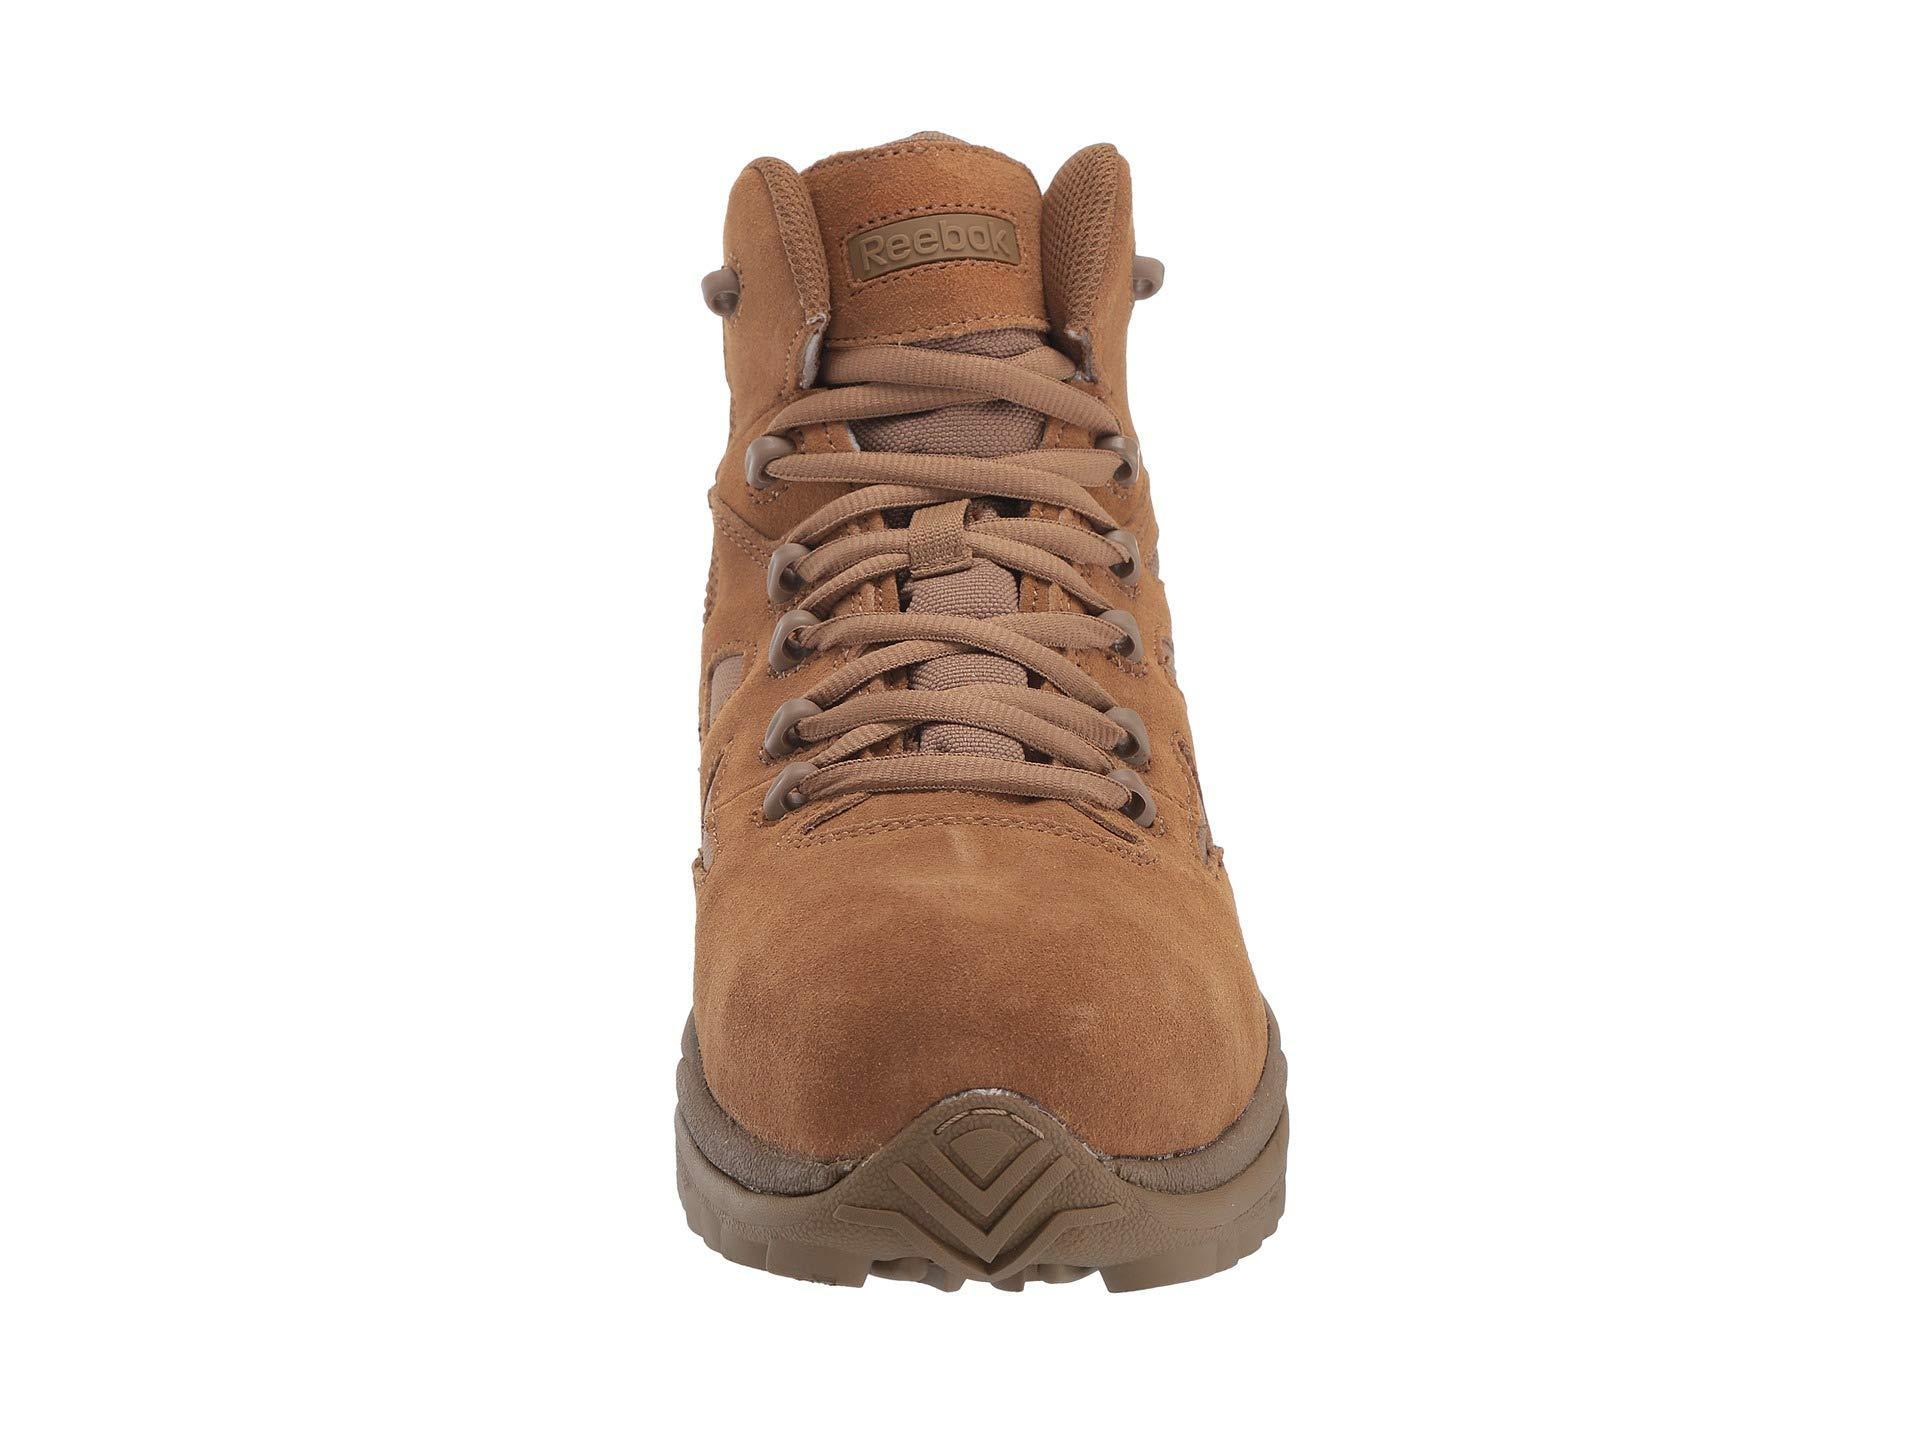 1fccab8f806 Reebok Brown 6 Rapid Response Rb (coyote) Men's Work Boots for men